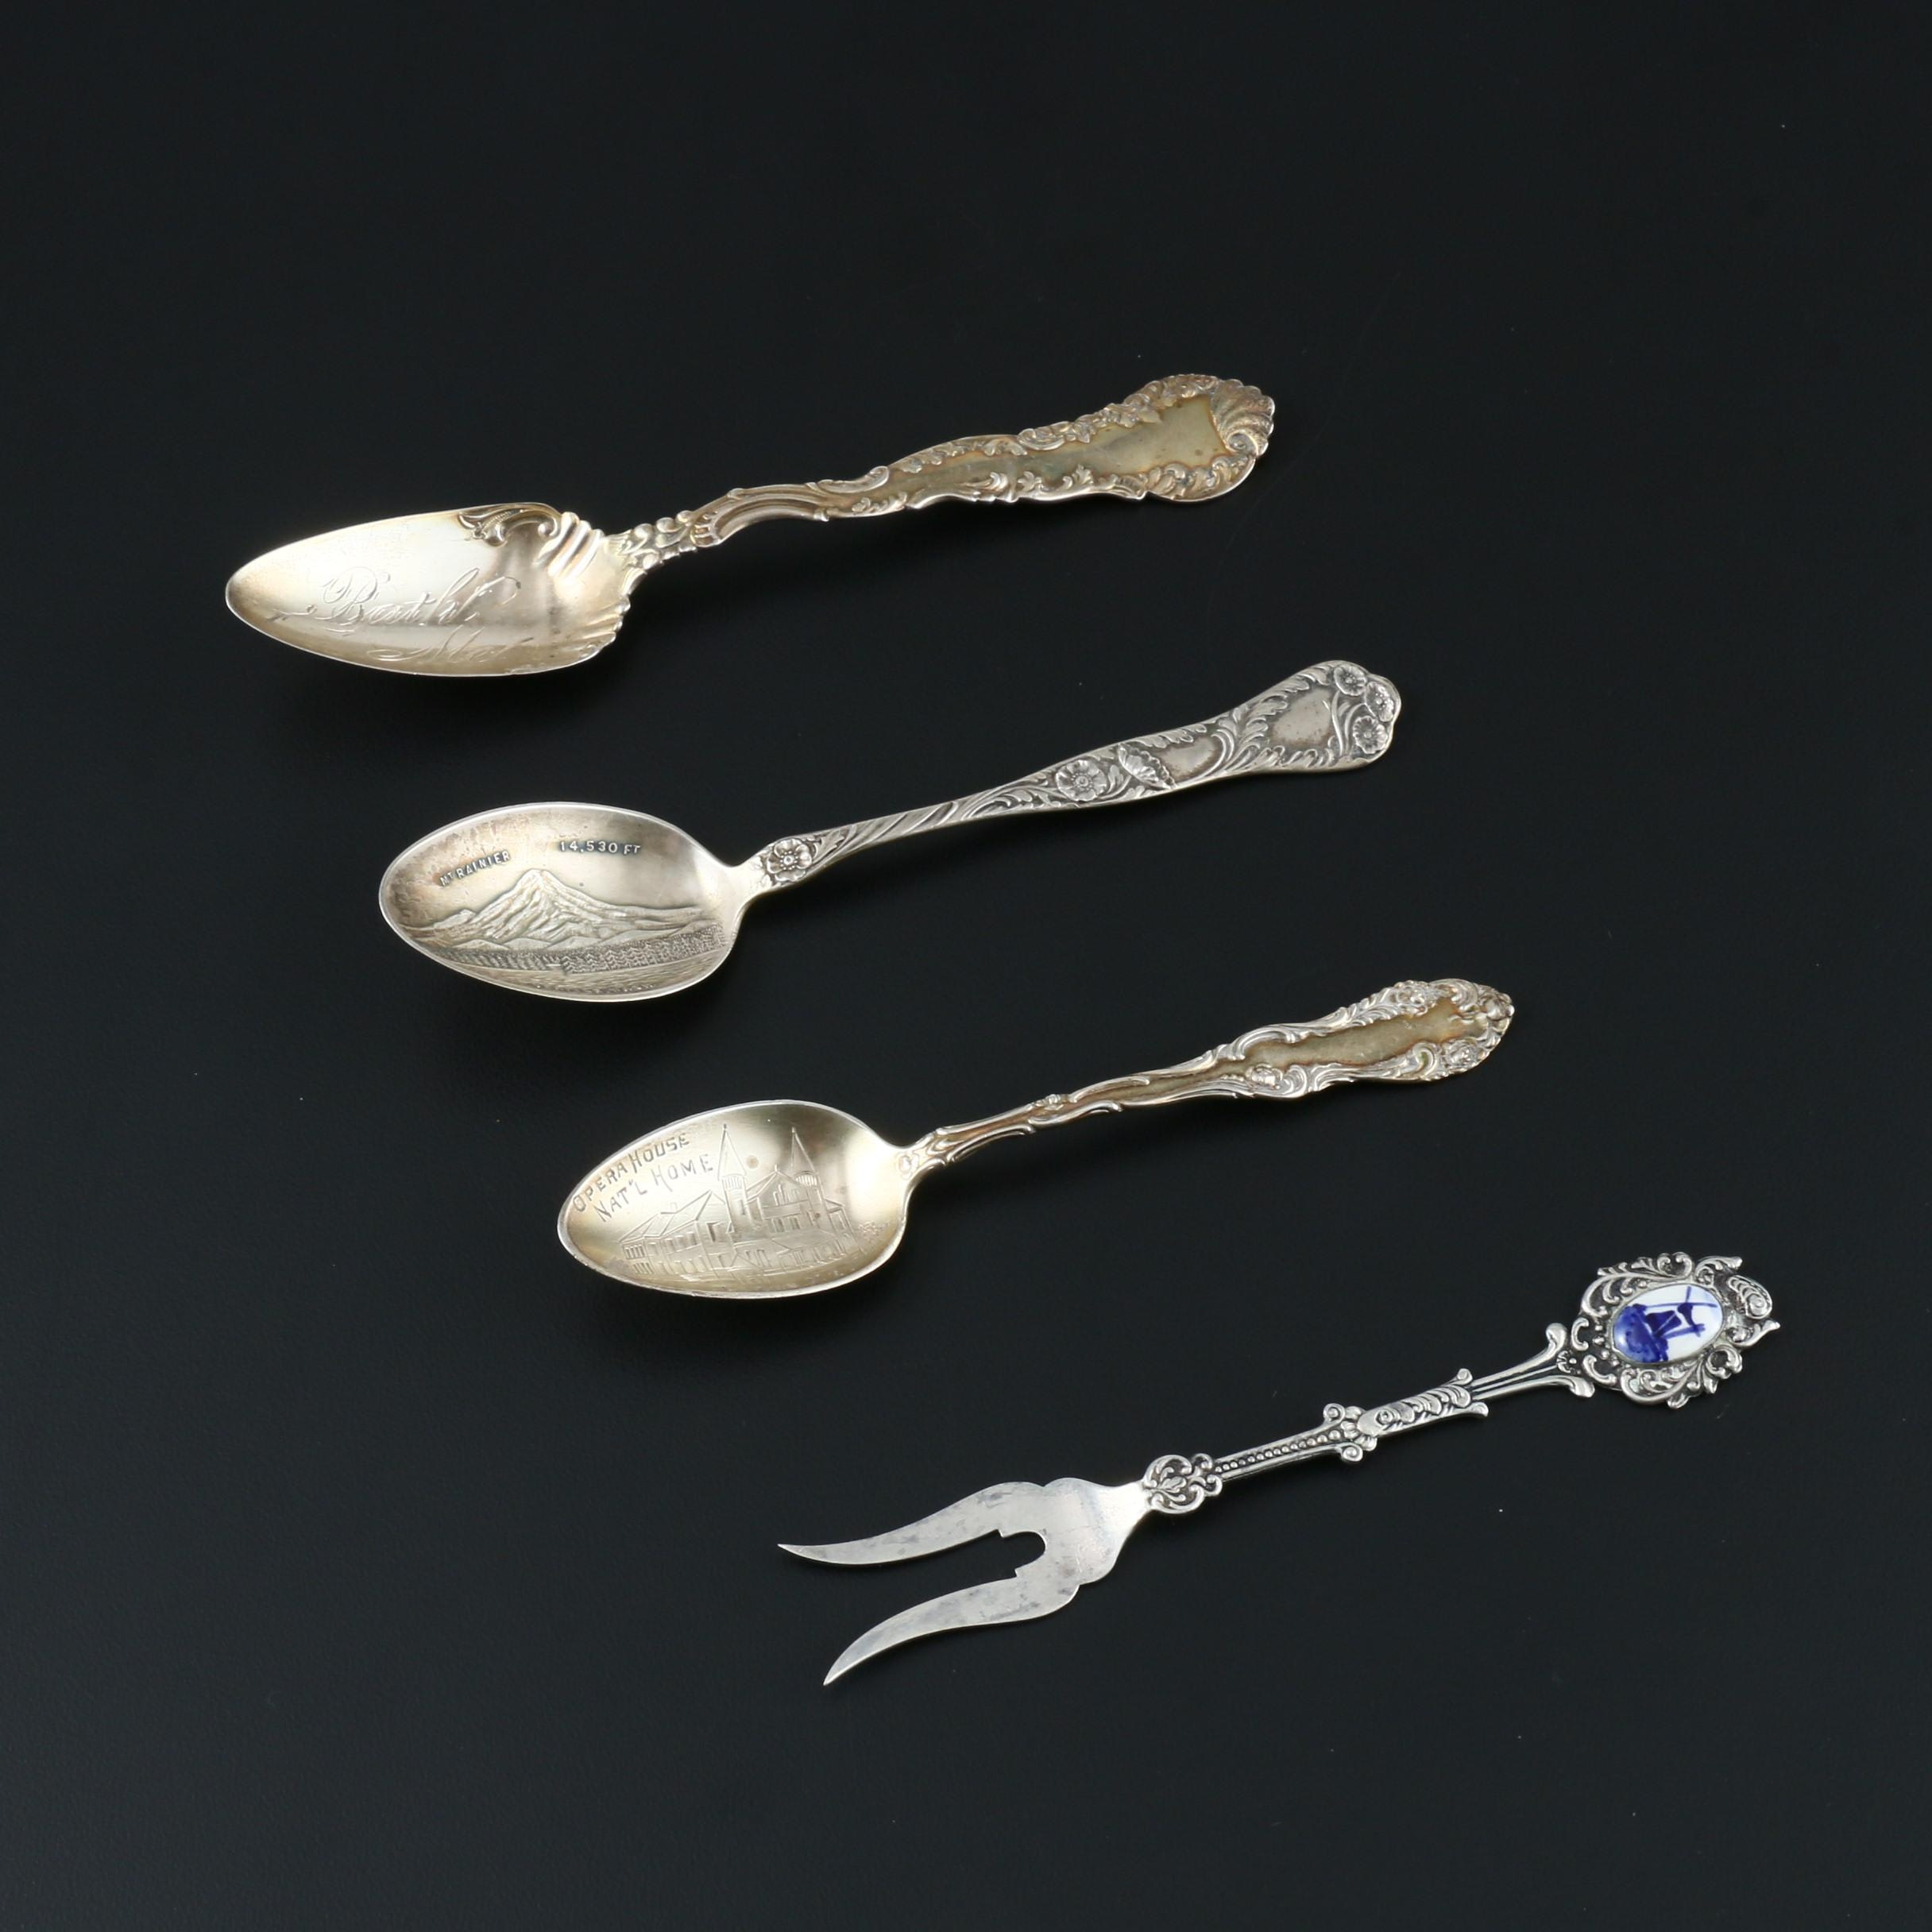 Sterling Silver Souvenir Spoons and 800 Silver Lemon Fork